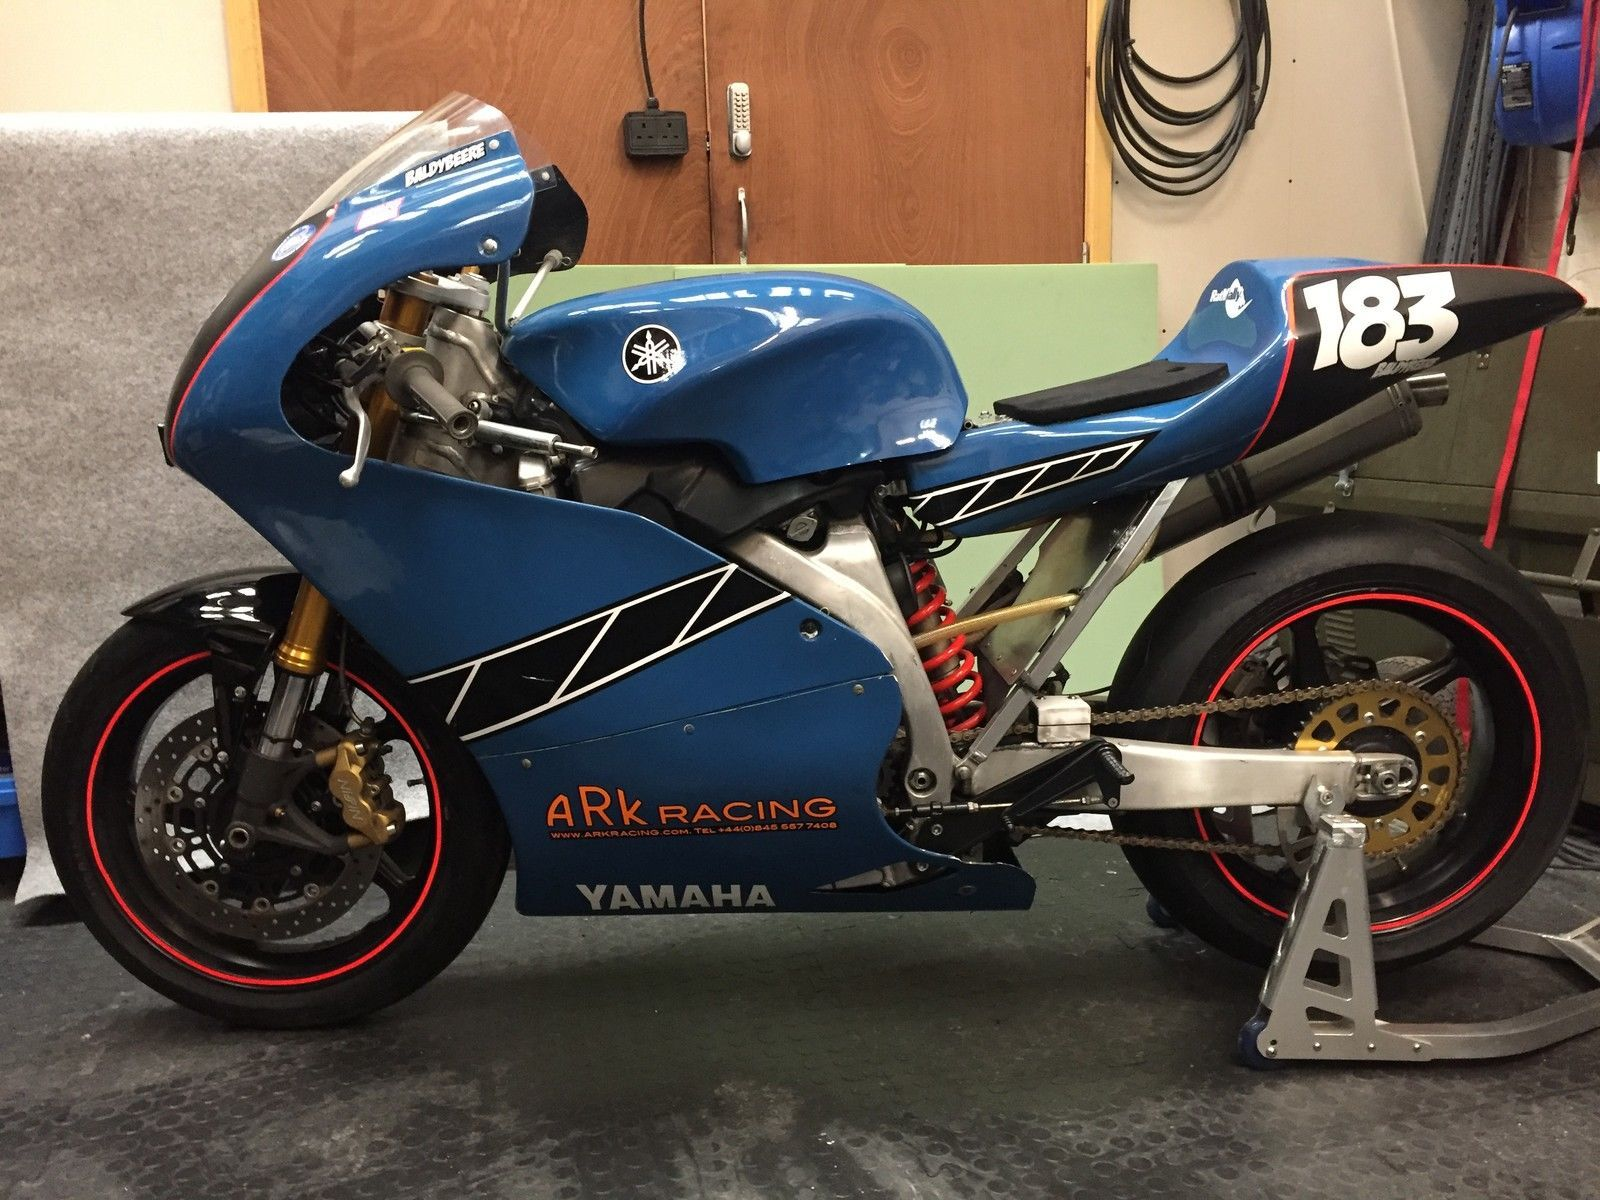 Moto 450 Gp45 Supermono Race Bike For Sale Ebay Racing Bikes Racing Motorcycles Yamaha Bikes